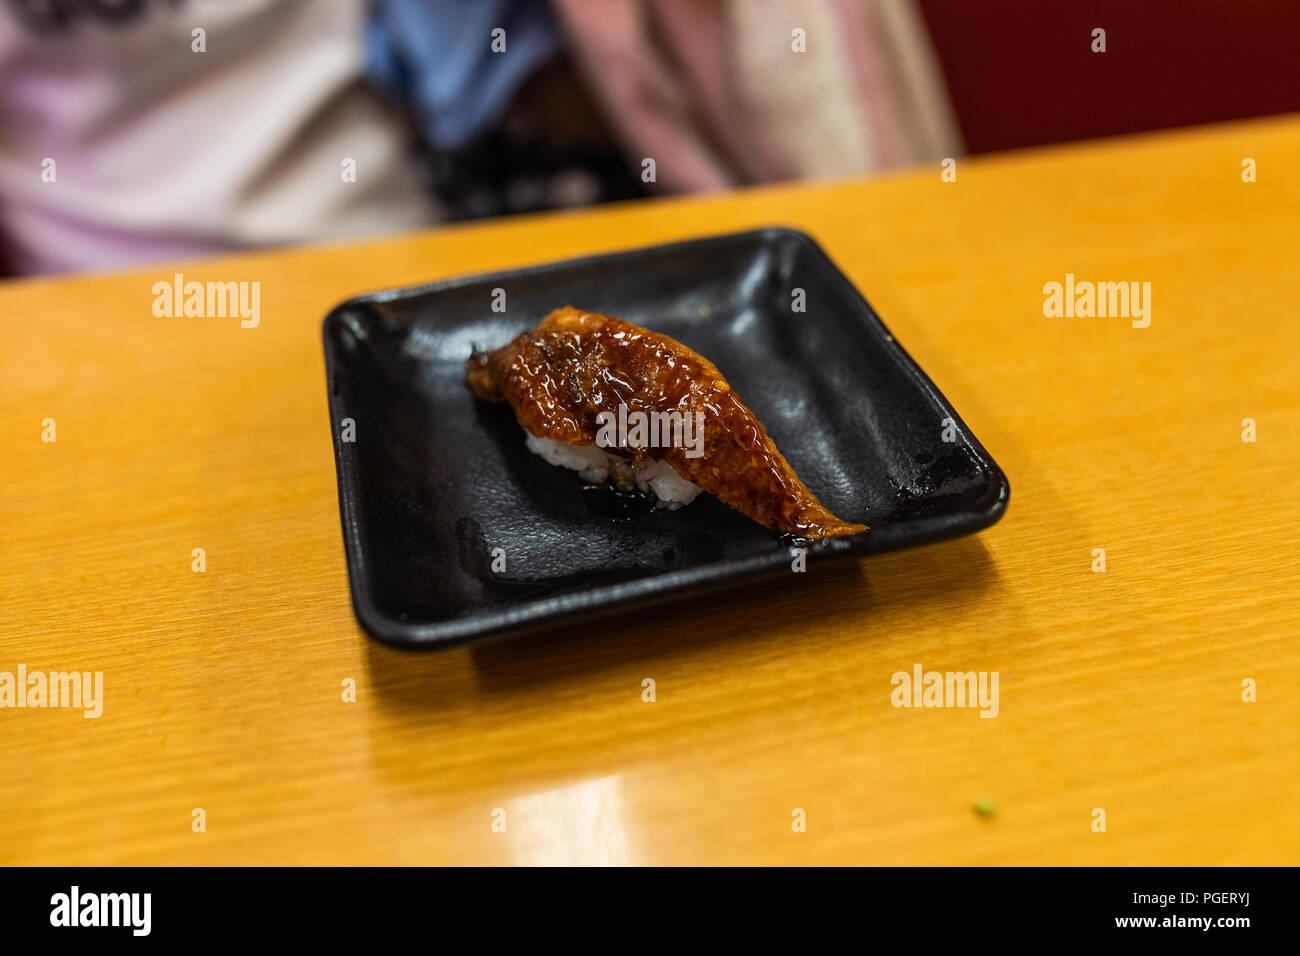 Eel on plate sitting on table. - Stock Image